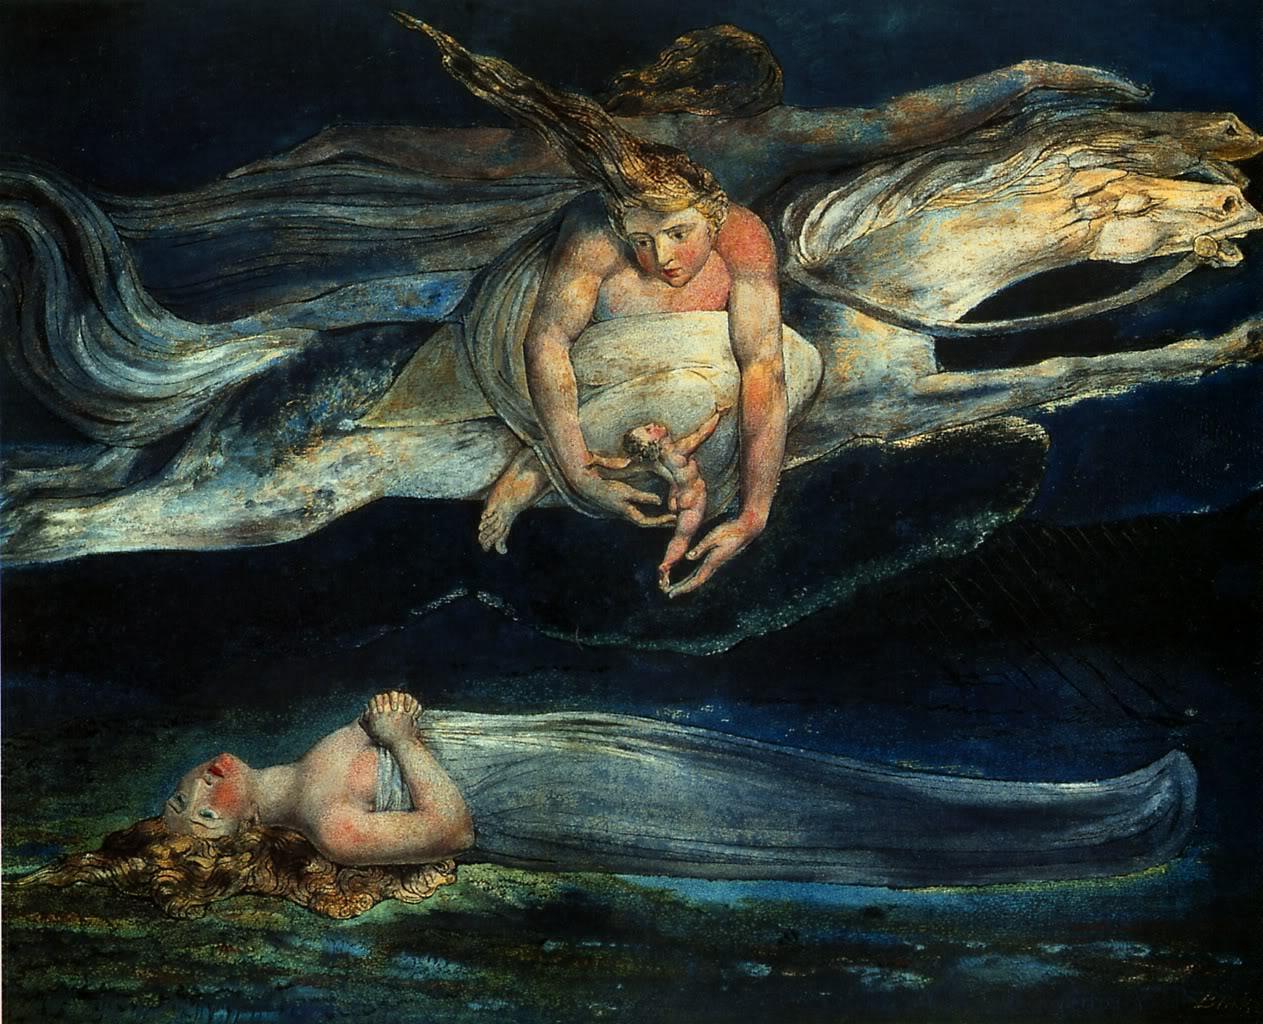 William Blake, ingiliz şair, ressam (ÖY-1827) tarihte bugün